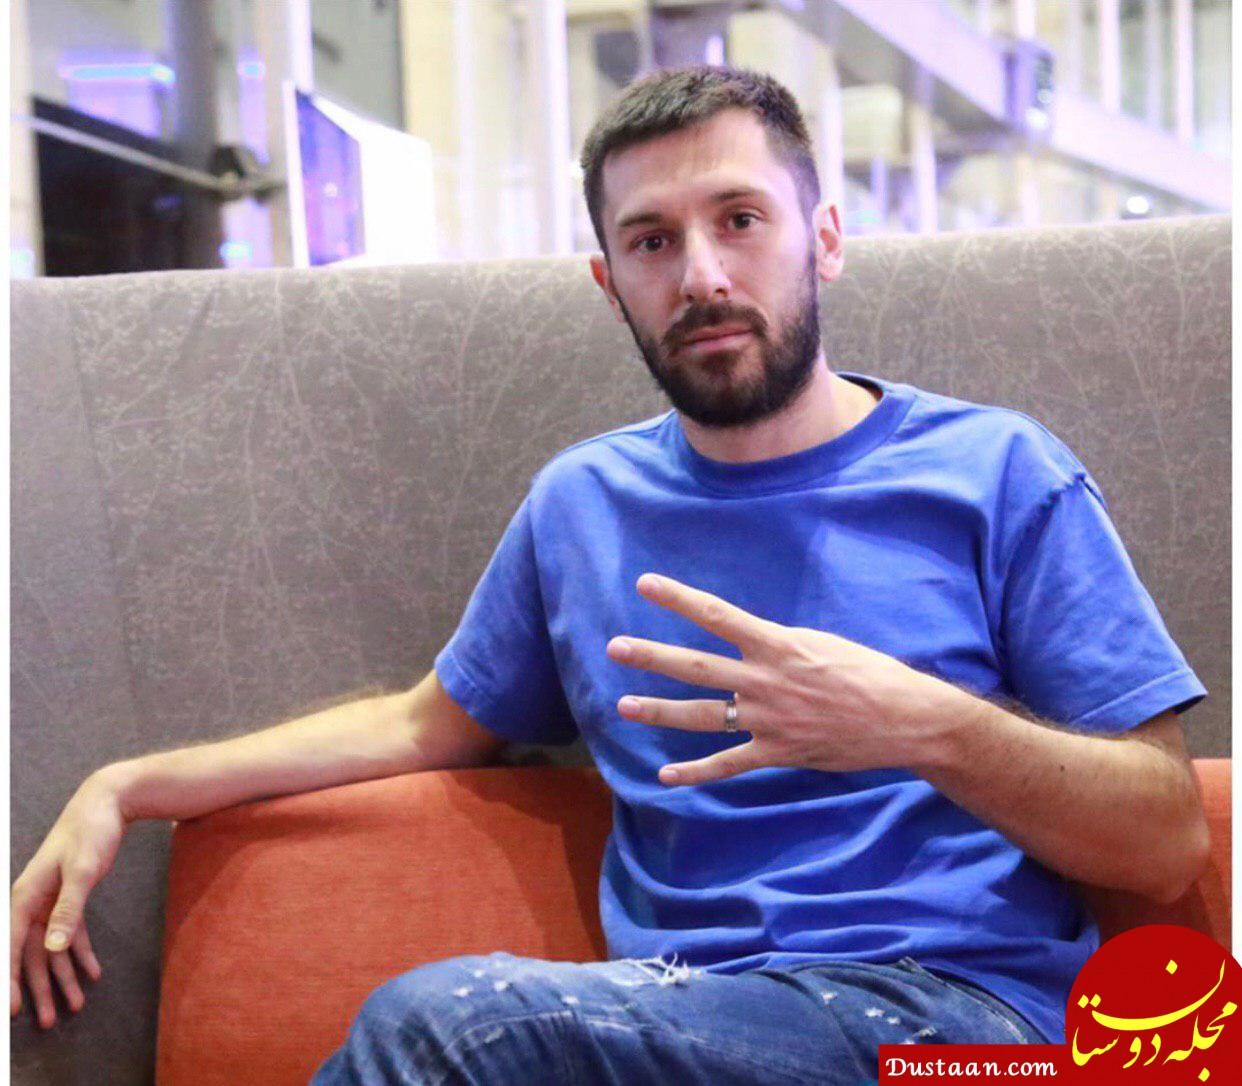 www.dustaan.com هروویه میلیچ وارد تهران شد